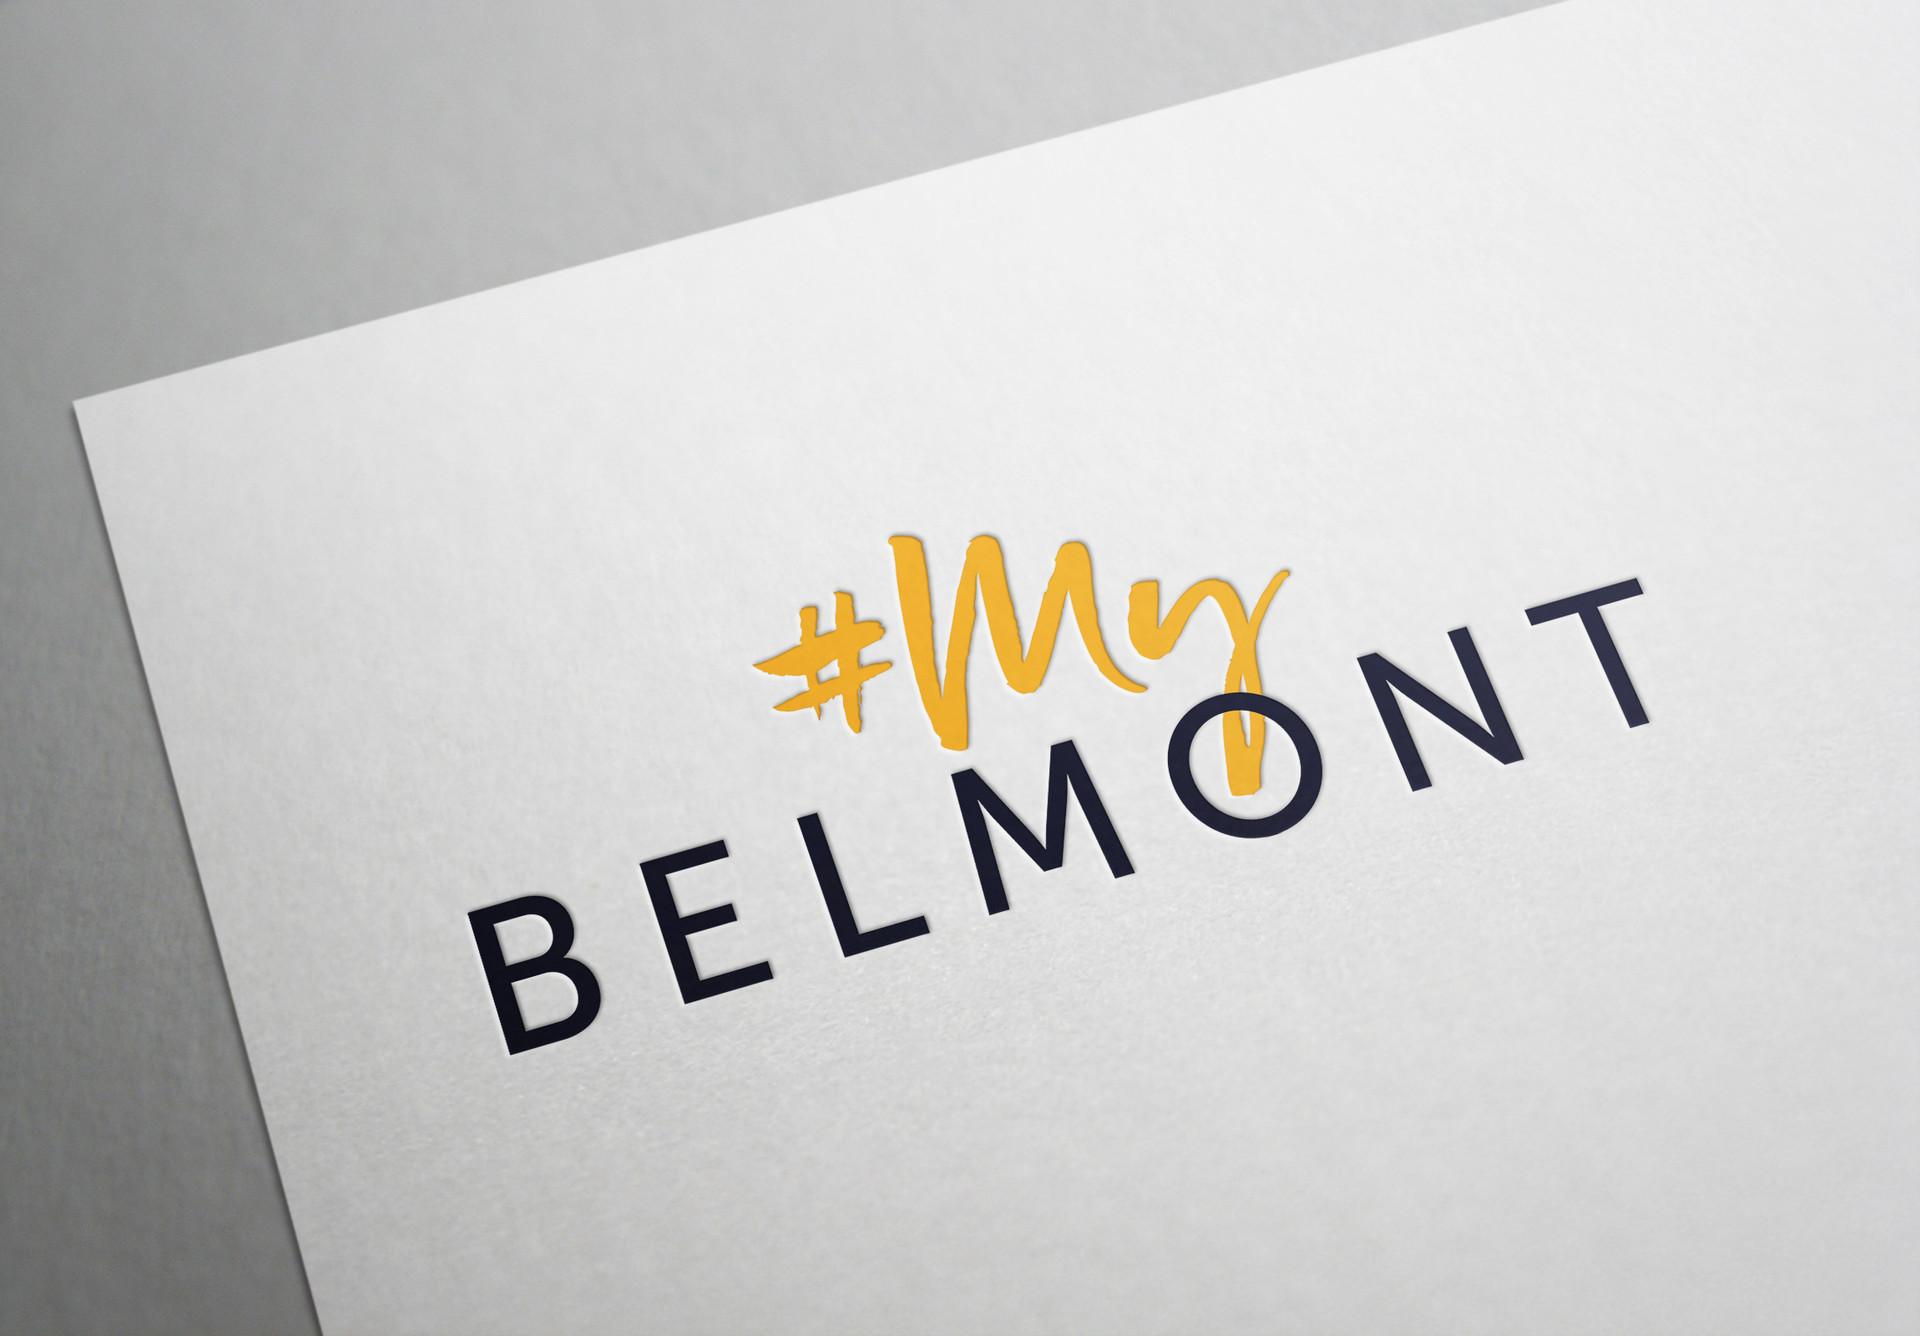 My Belmont Logo Design